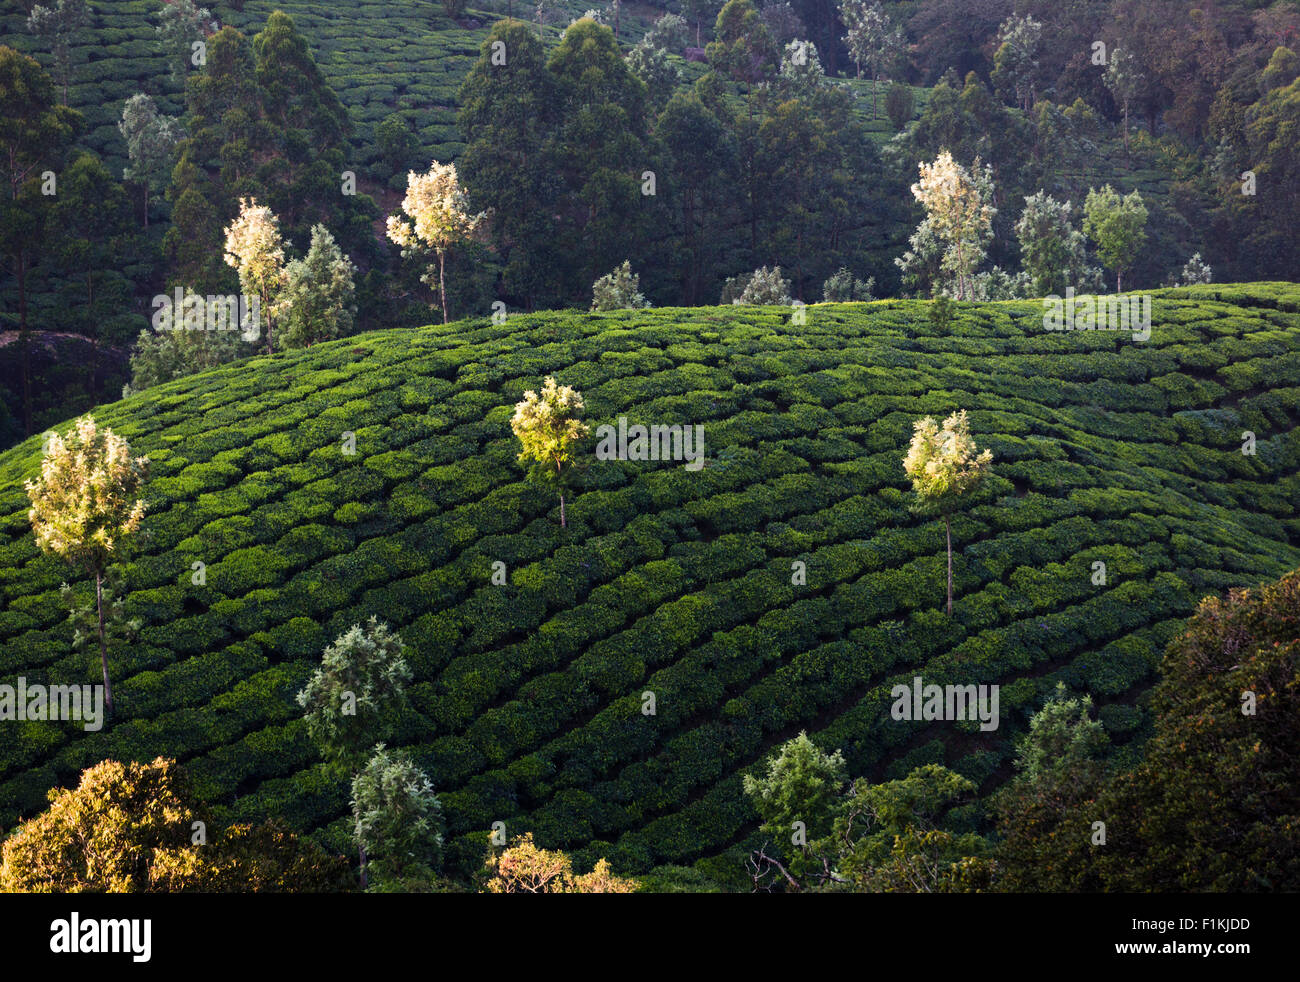 Plantación de té Pothamedu soslayar, la autopista nacional 49 cerca de Munnar, India. Silver Oak árboles Imagen De Stock